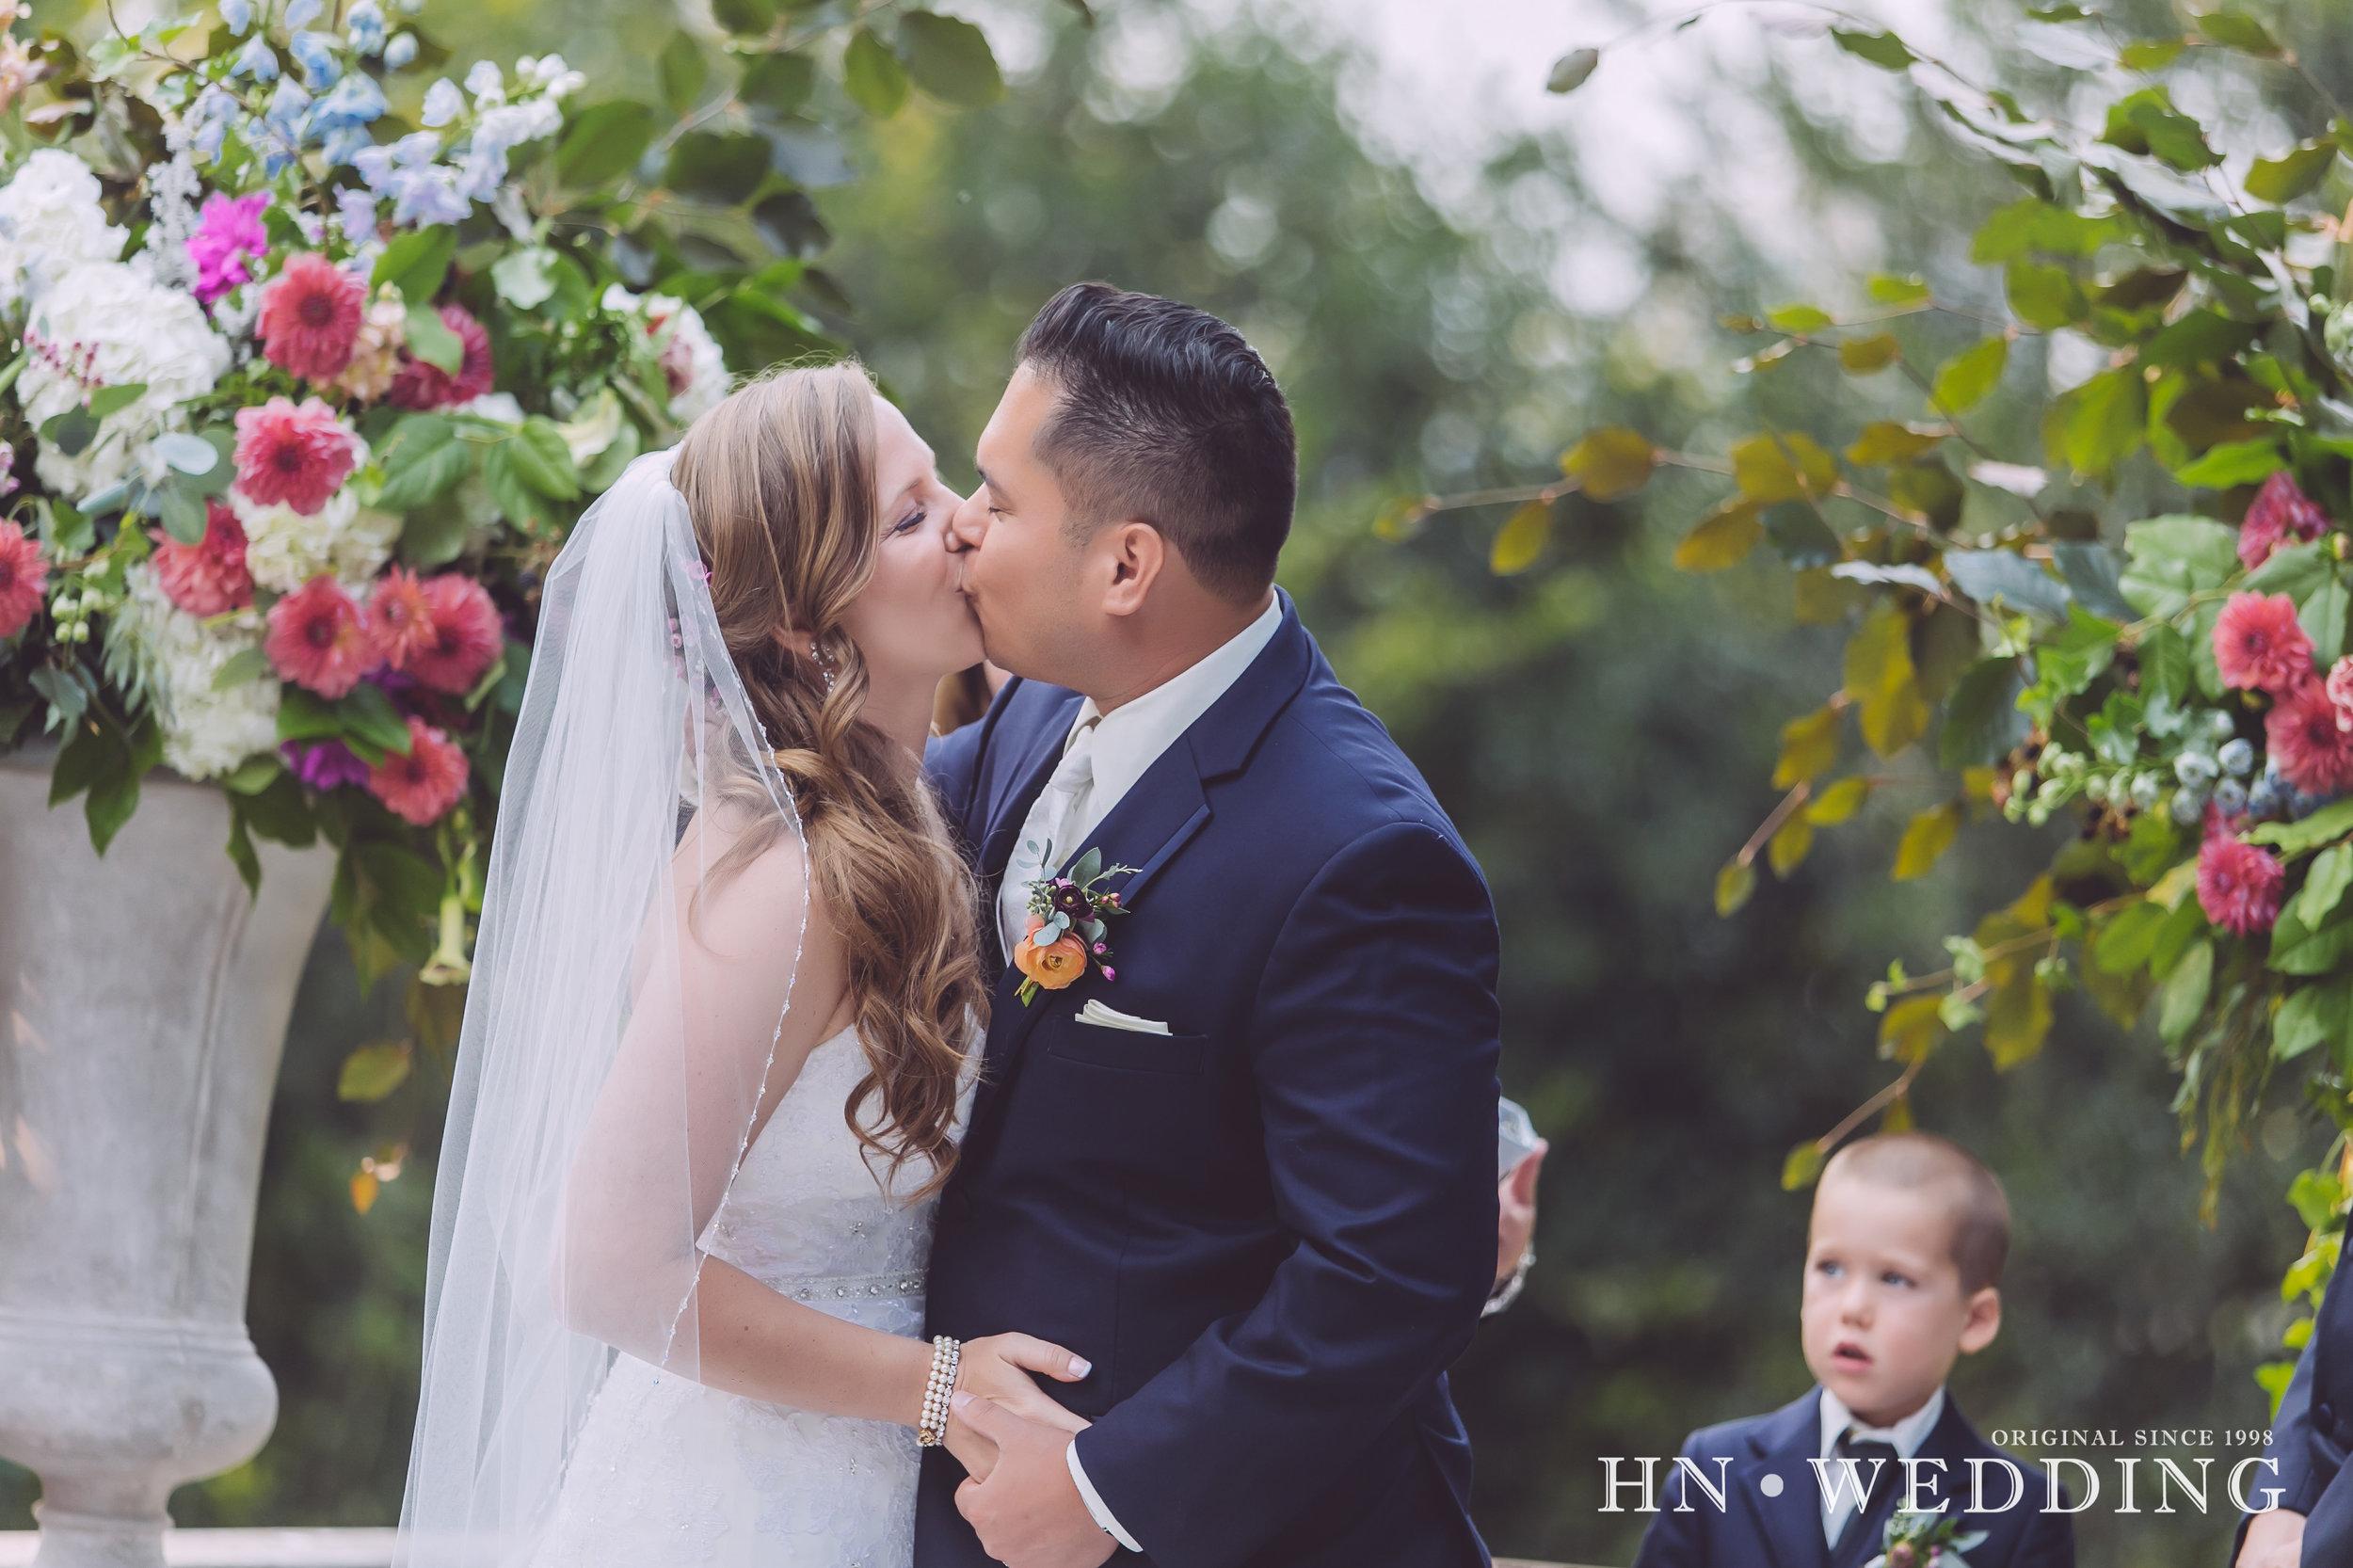 hnwedding20170806weddingday-64.jpg